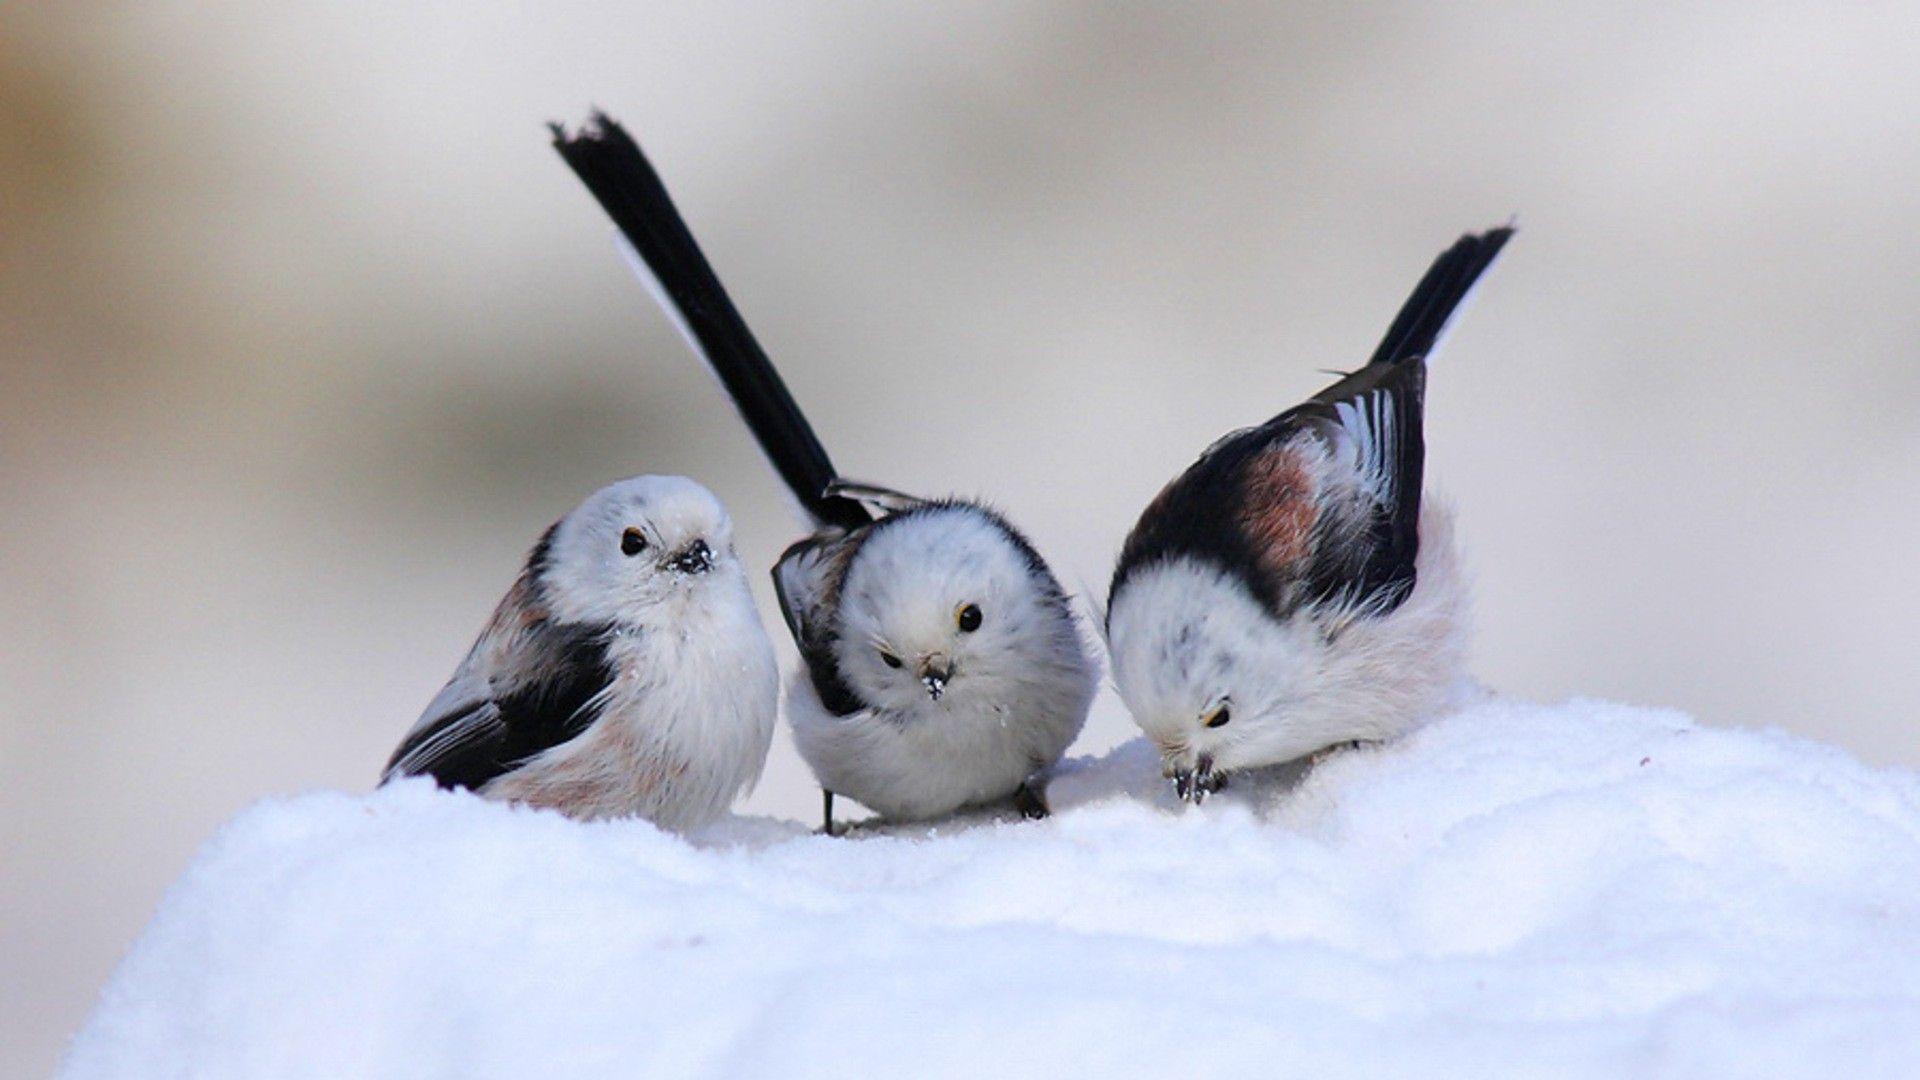 Photos Of Birds Birds Wallpaper Snow Images 1920x1080 Beautiful Birds Birds Bird Wallpaper